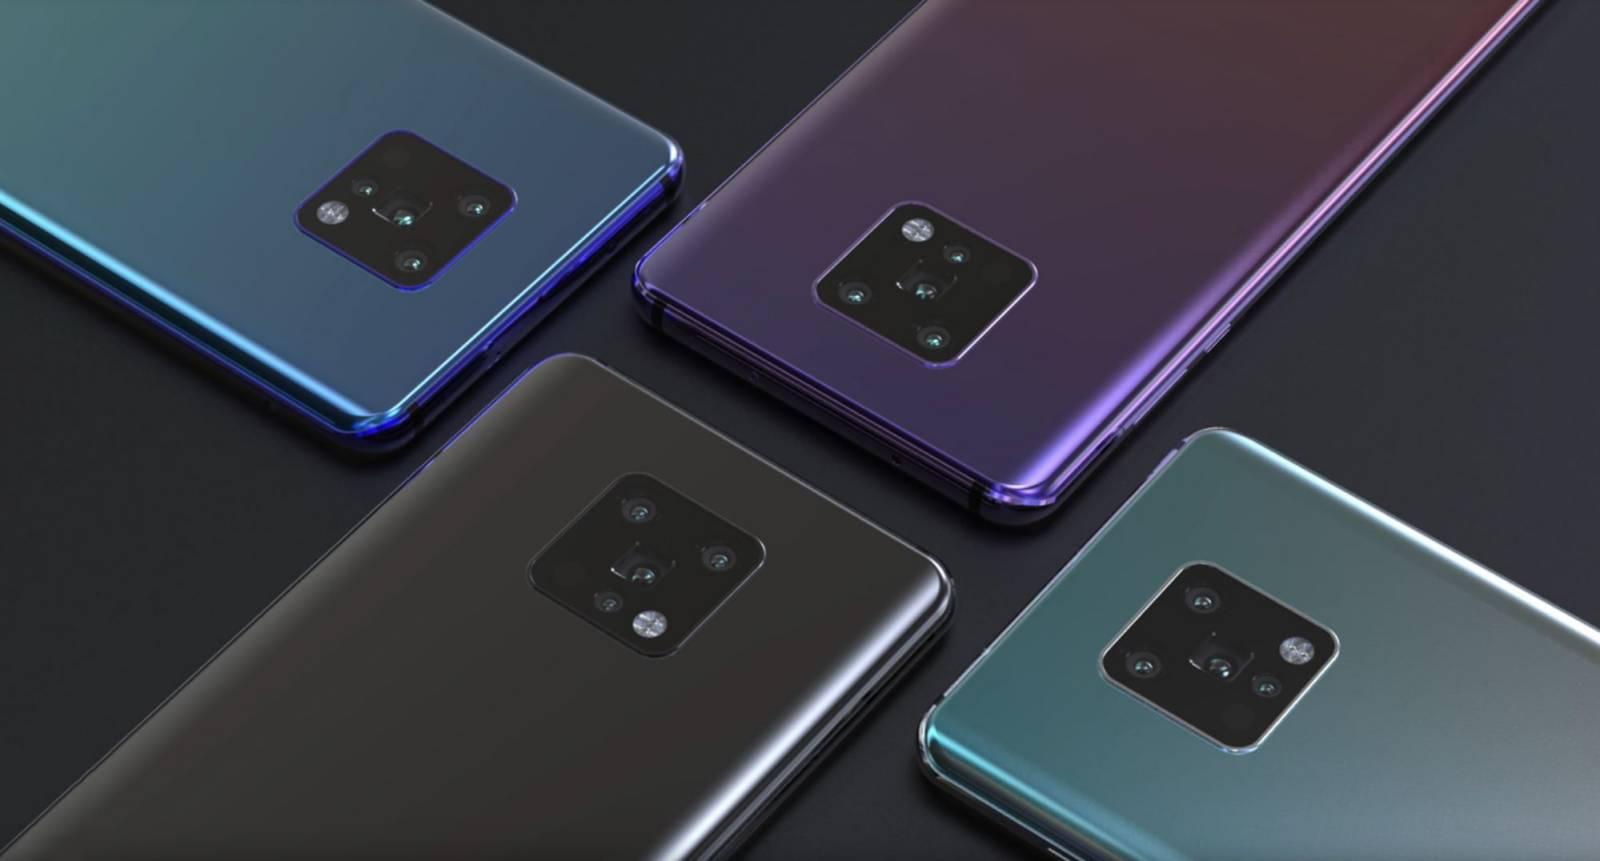 Huawei MATE 30 PRO looks